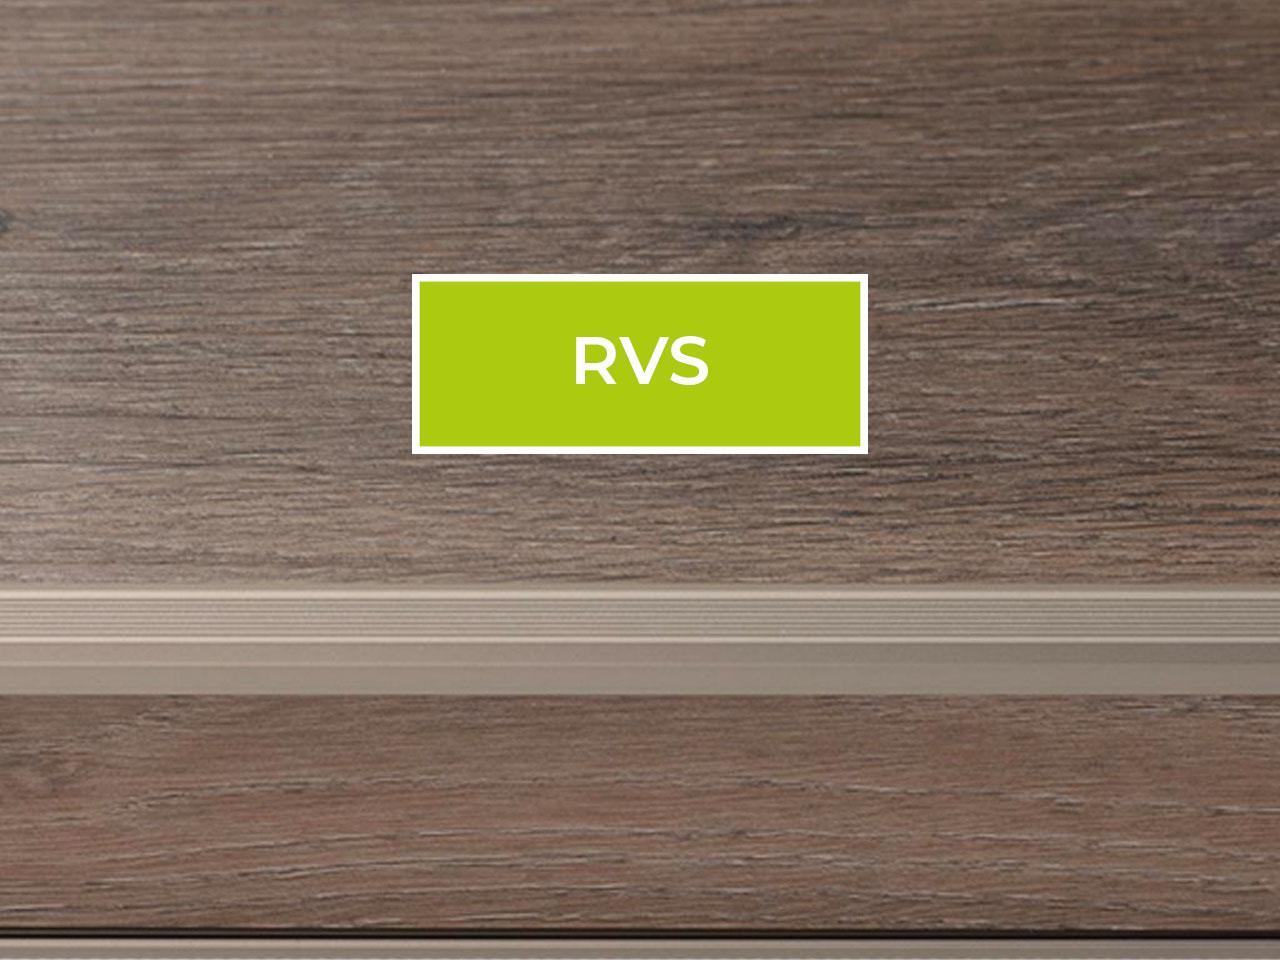 Trapneus profiel voor PVC traprenovatie kleur RVS